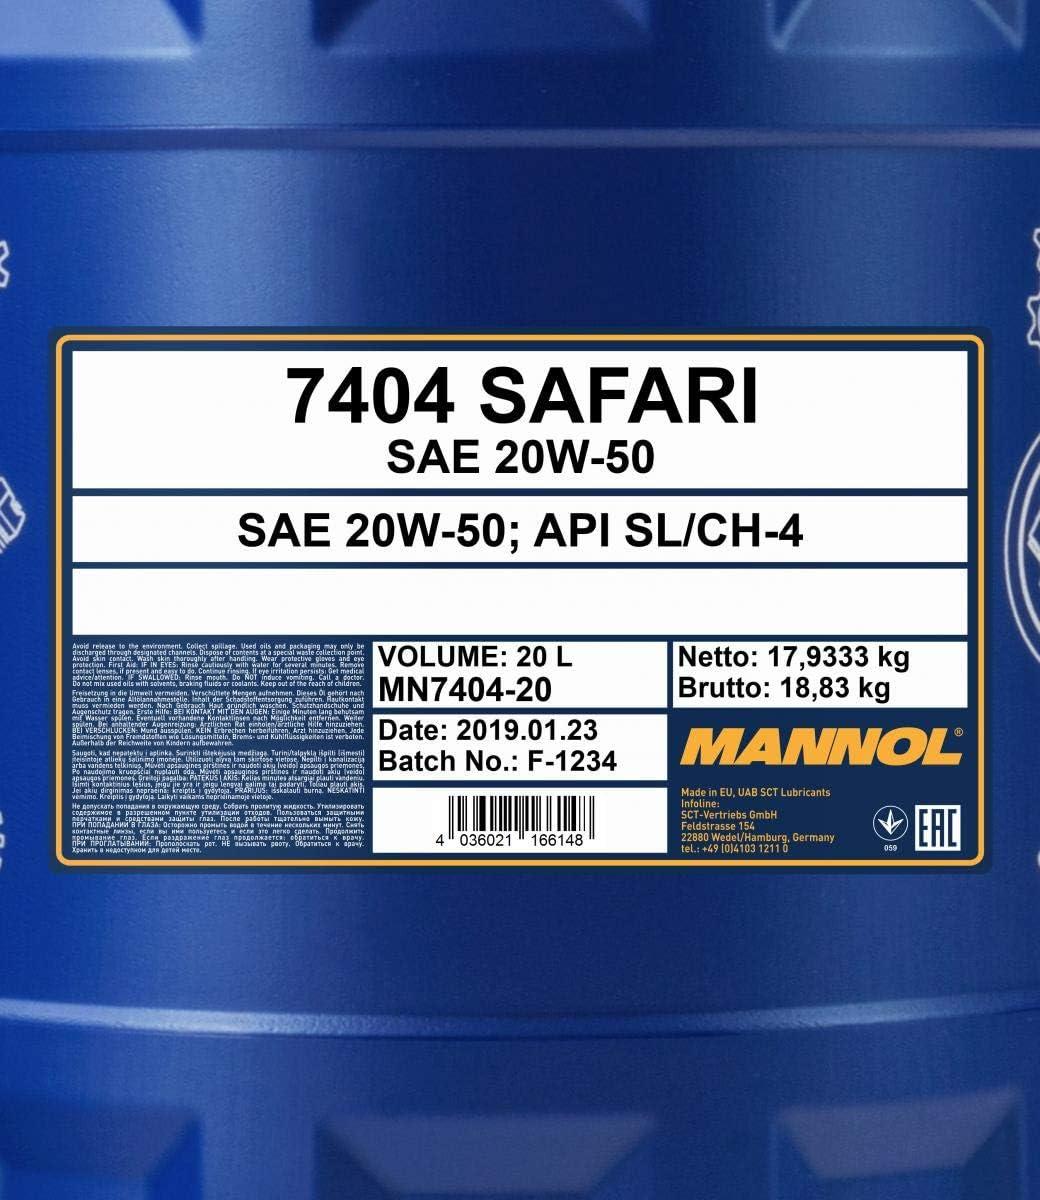 Mannol 20l Safari 20w 50 Engine Oil Api Sl Cf Universal Oil Outlet Tap For Vintage Cars Auto